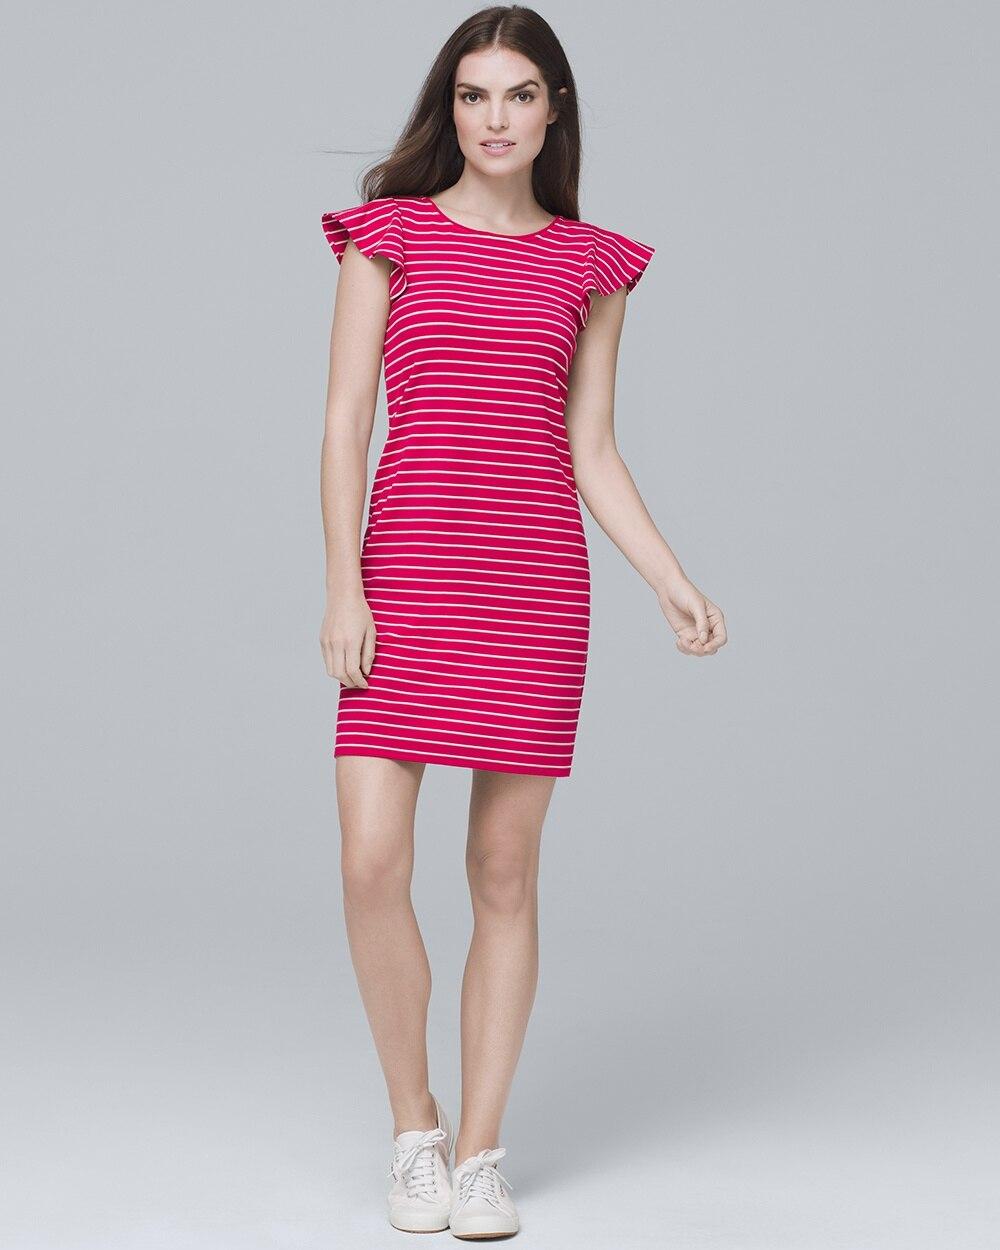 6ecc07cf28 Flounce-Sleeve Stripe Knit Shift Dress - White House Black Market